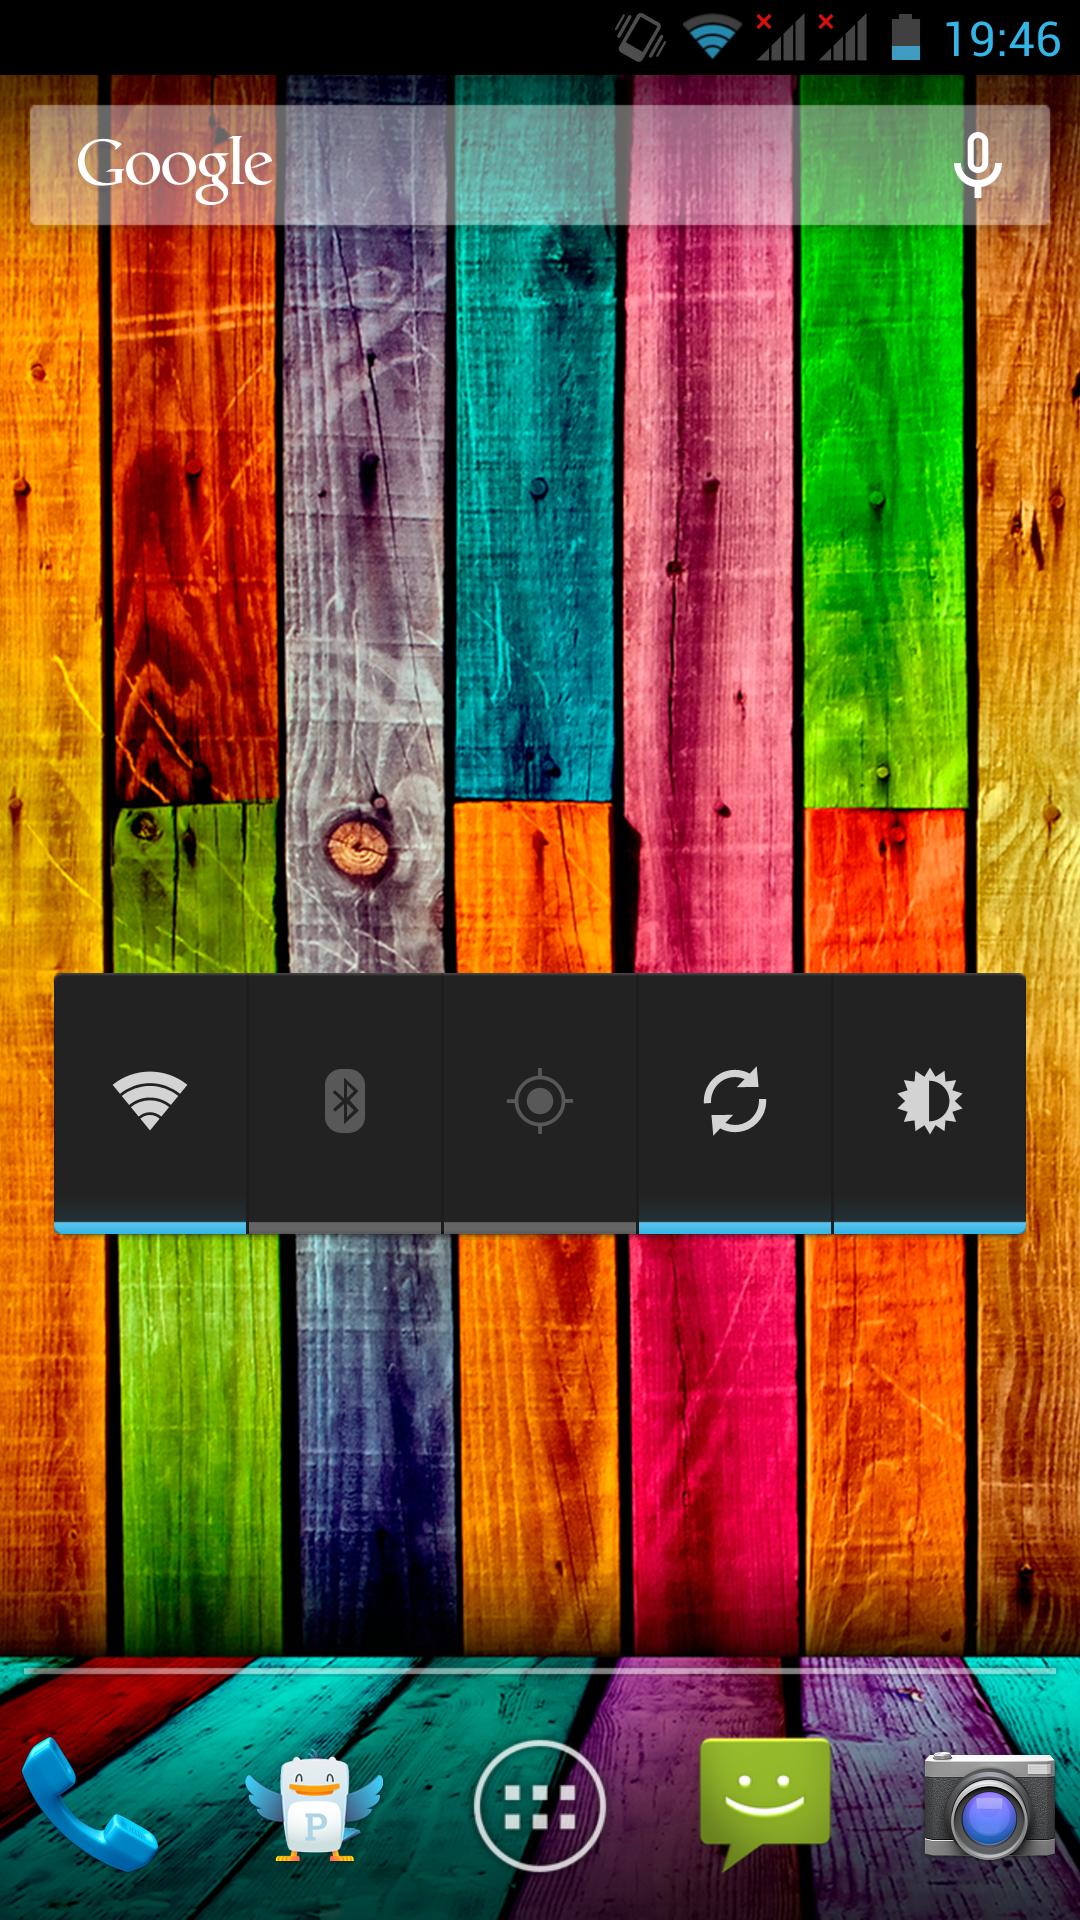 Screenshot_2014-07-11-19-46-21